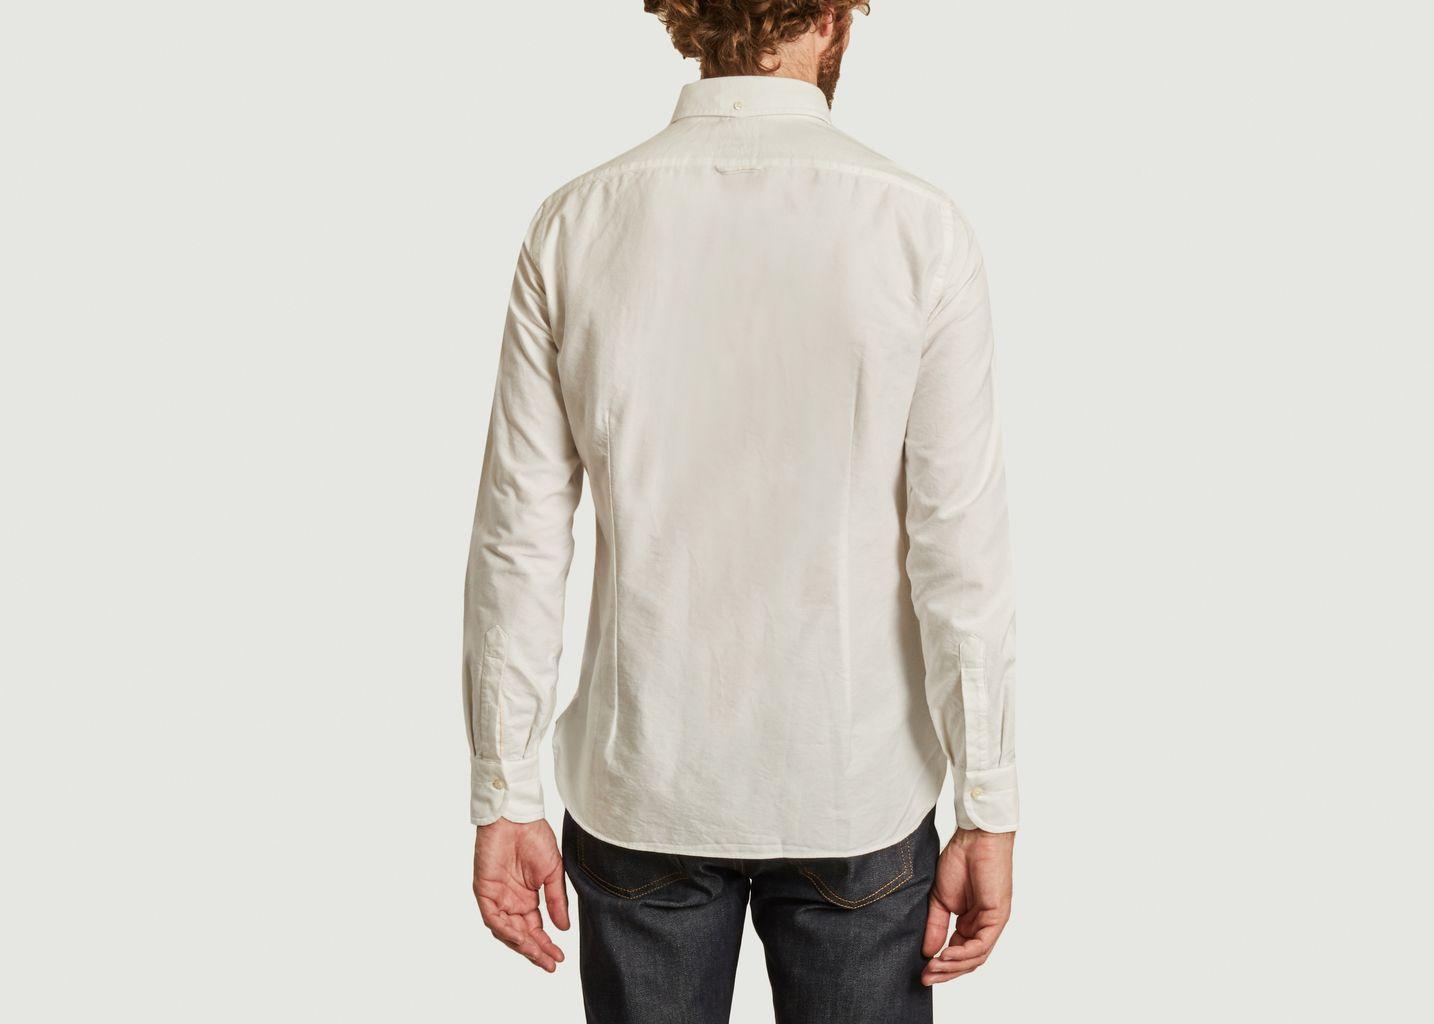 Chemise Oxford Selvedge - A.B.C.L. Garments